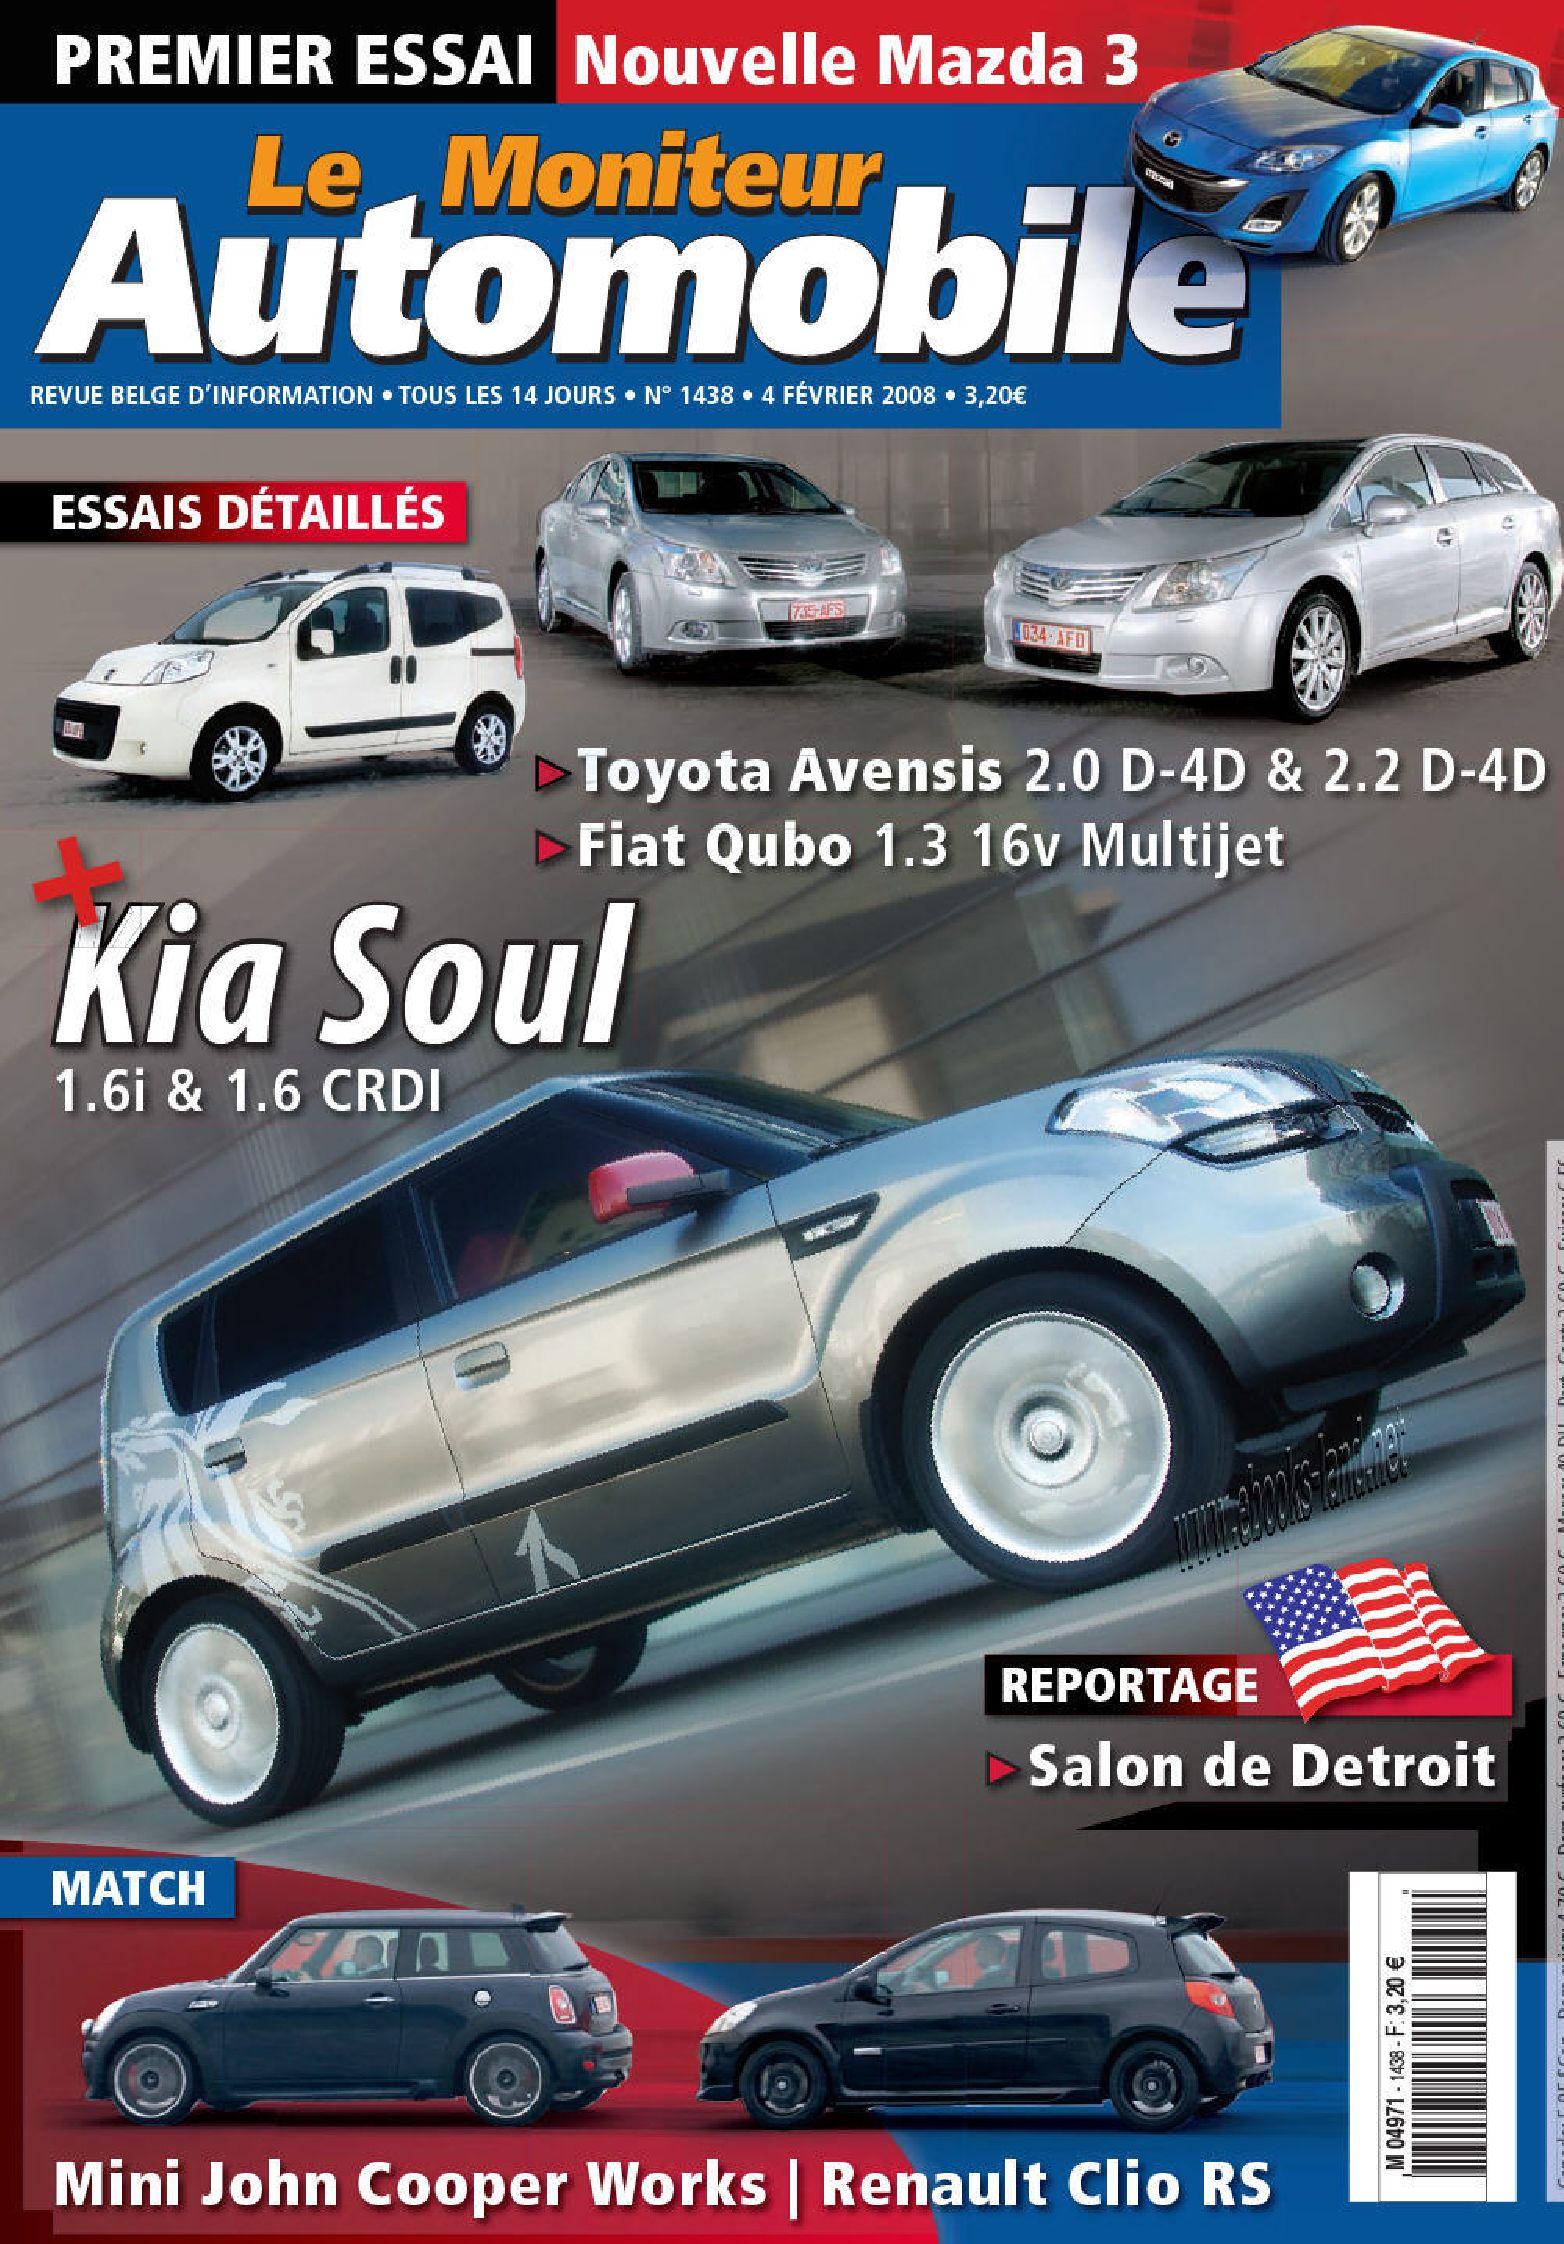 Moniteur.Automobile.N1438.French.Mag-eLAND.pdf by ebooks land - issuu